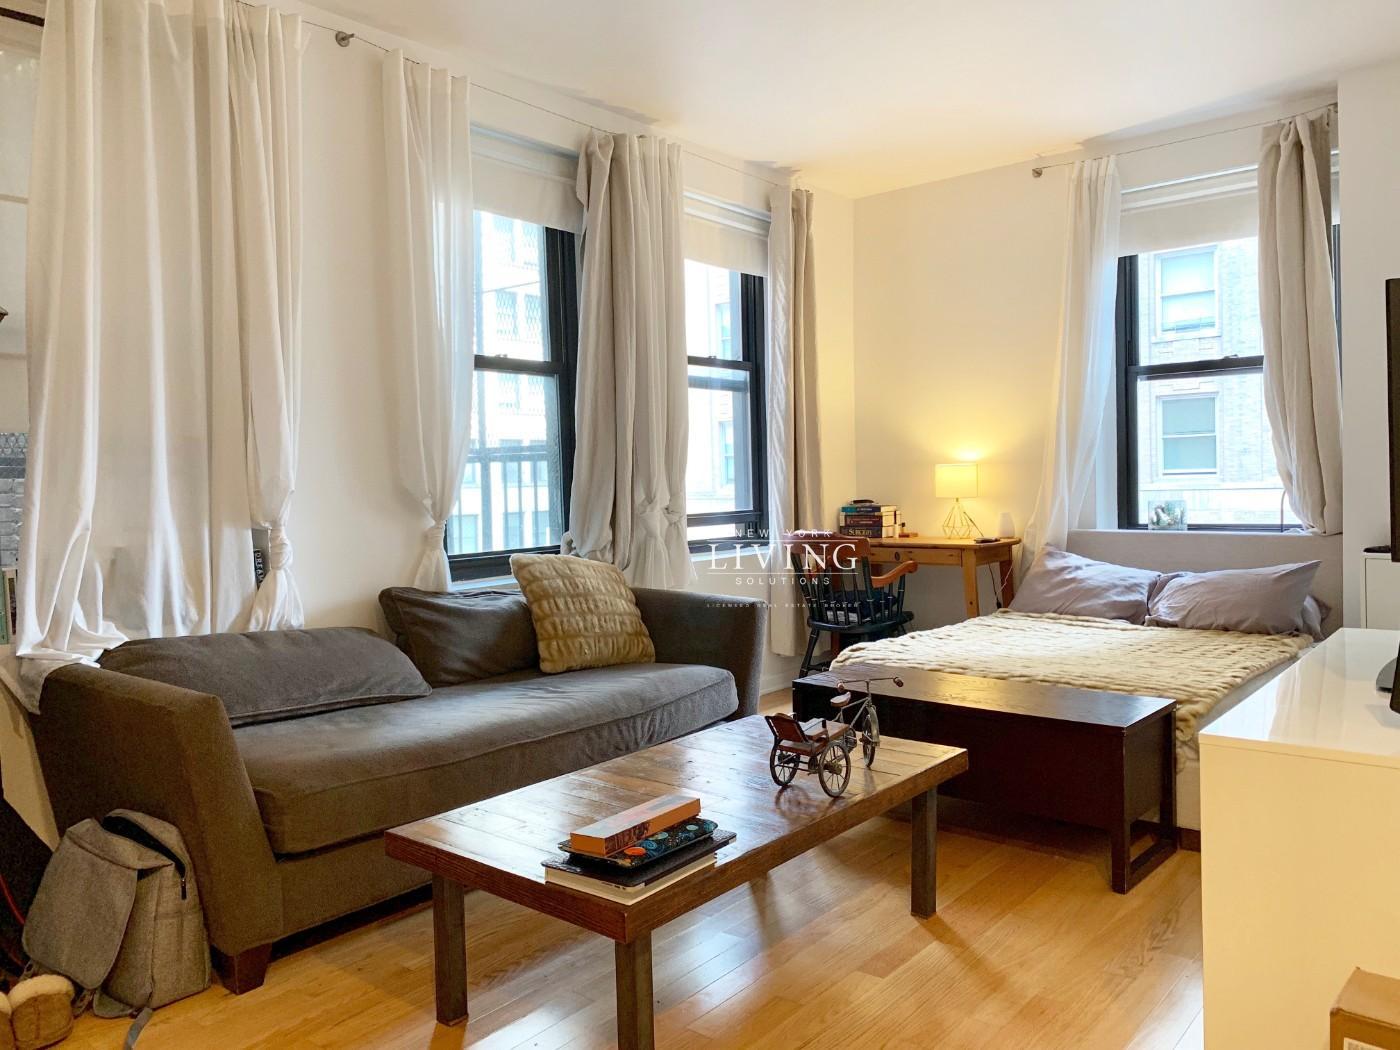 56 Pine Street, Apt 15C, Manhattan, New York 10005